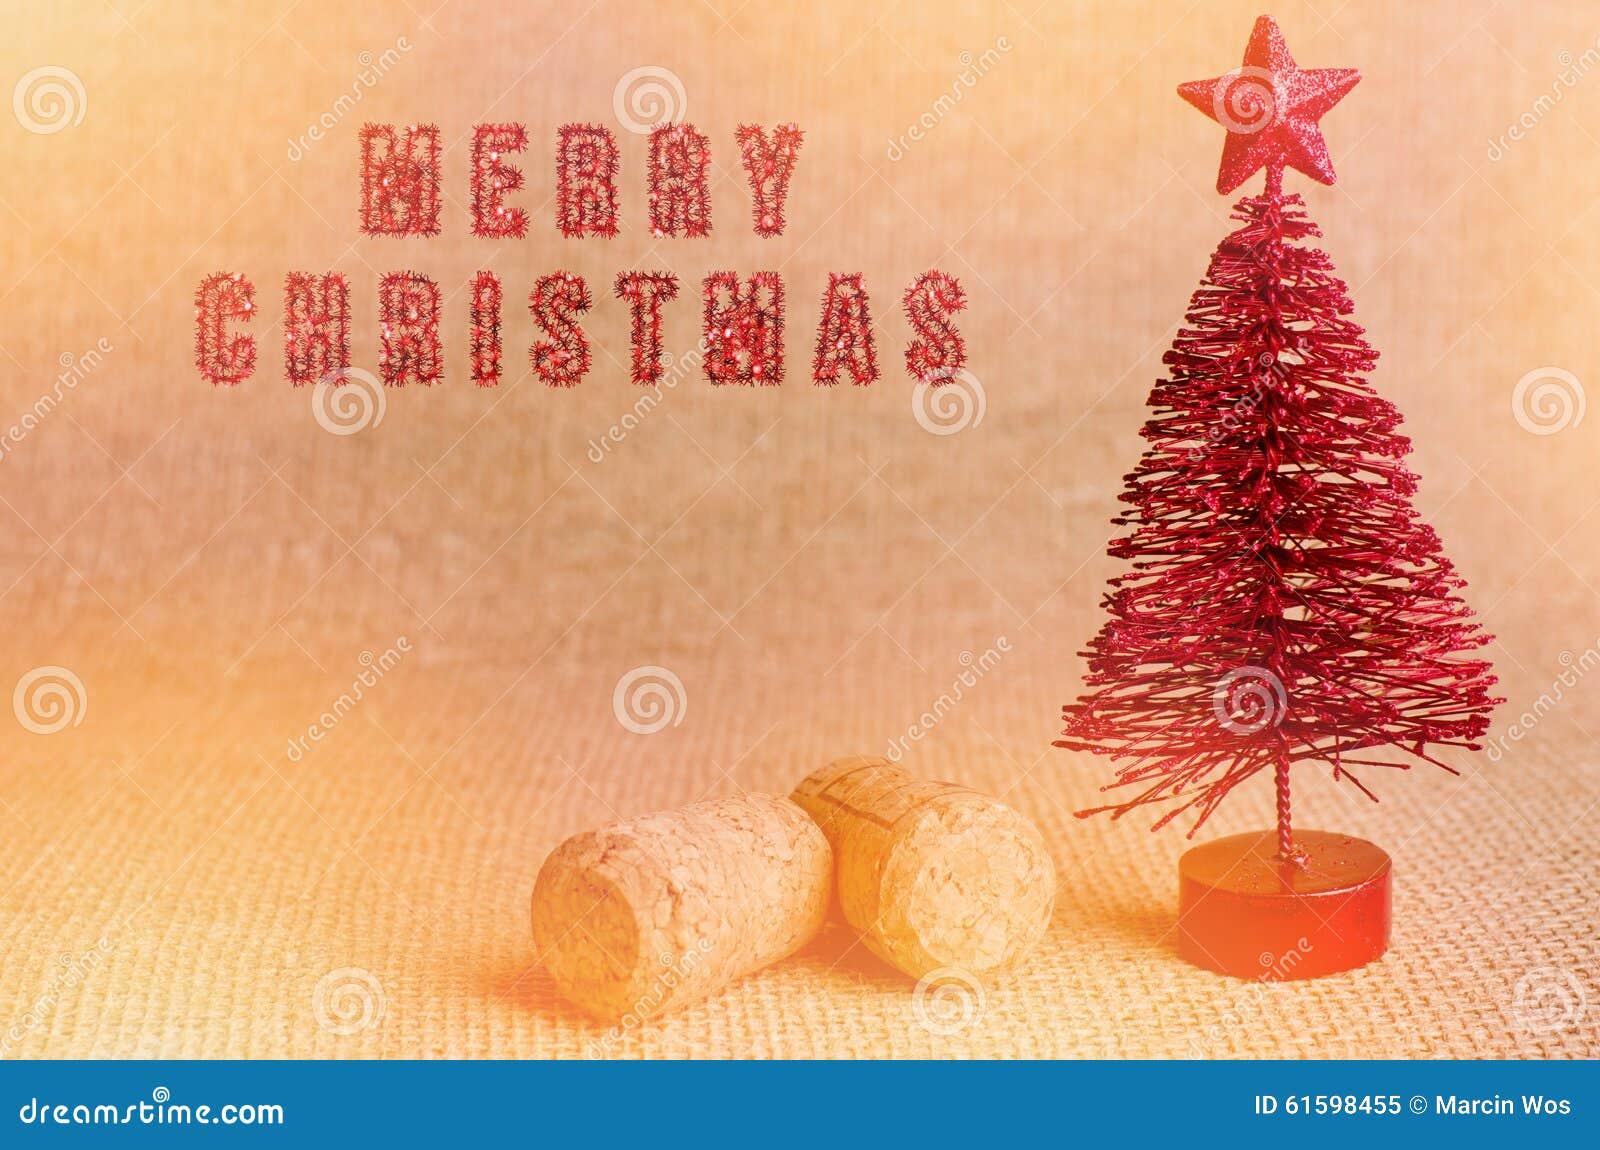 Wine Cork Christmas Tree Ornaments